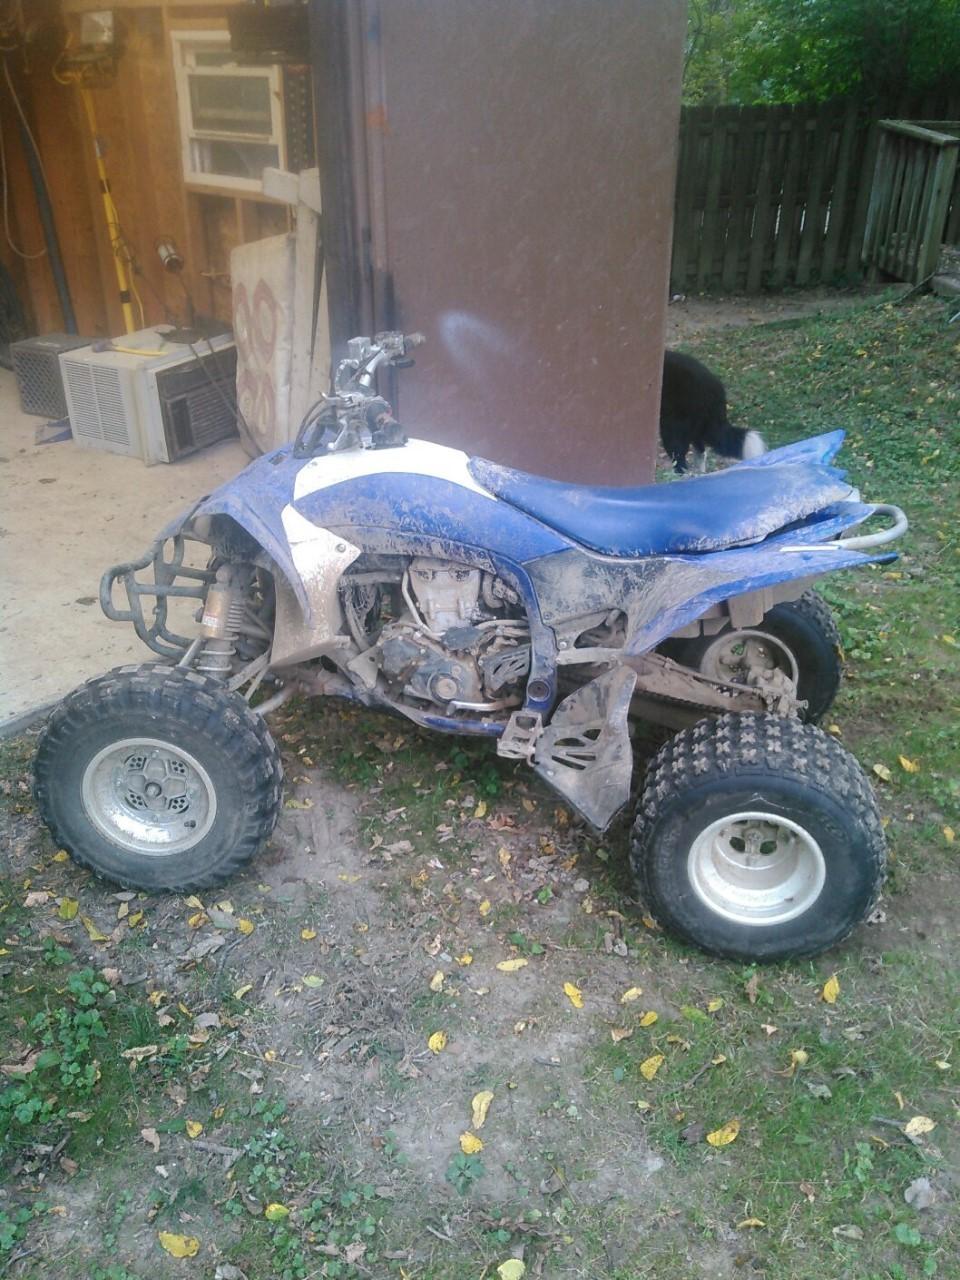 Ohio - MINI %26 POCKET ATVs For Sale - ATV Trader